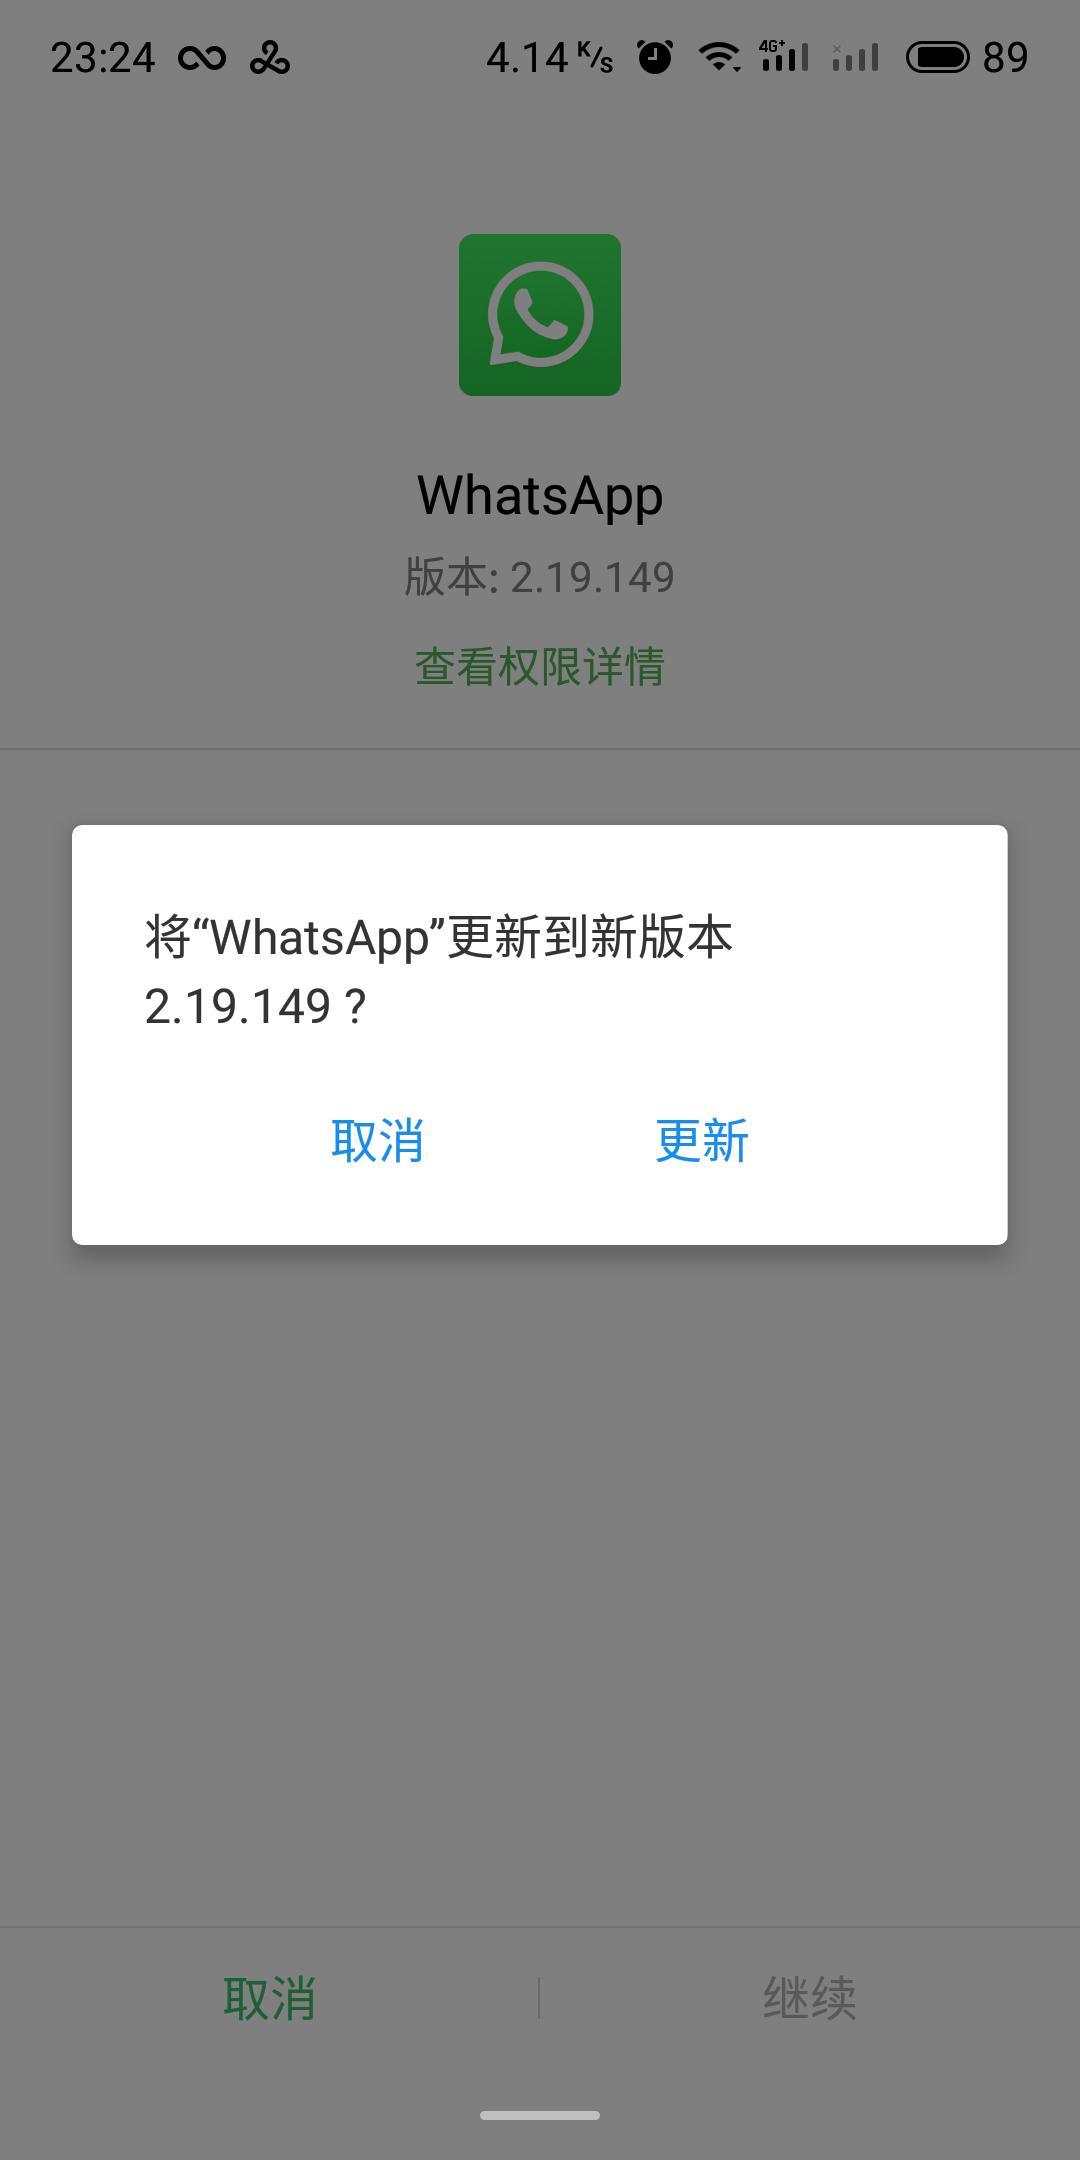 whatsapp最新版下载whatsapp时间不对日期不正确whatsapp怎么安装